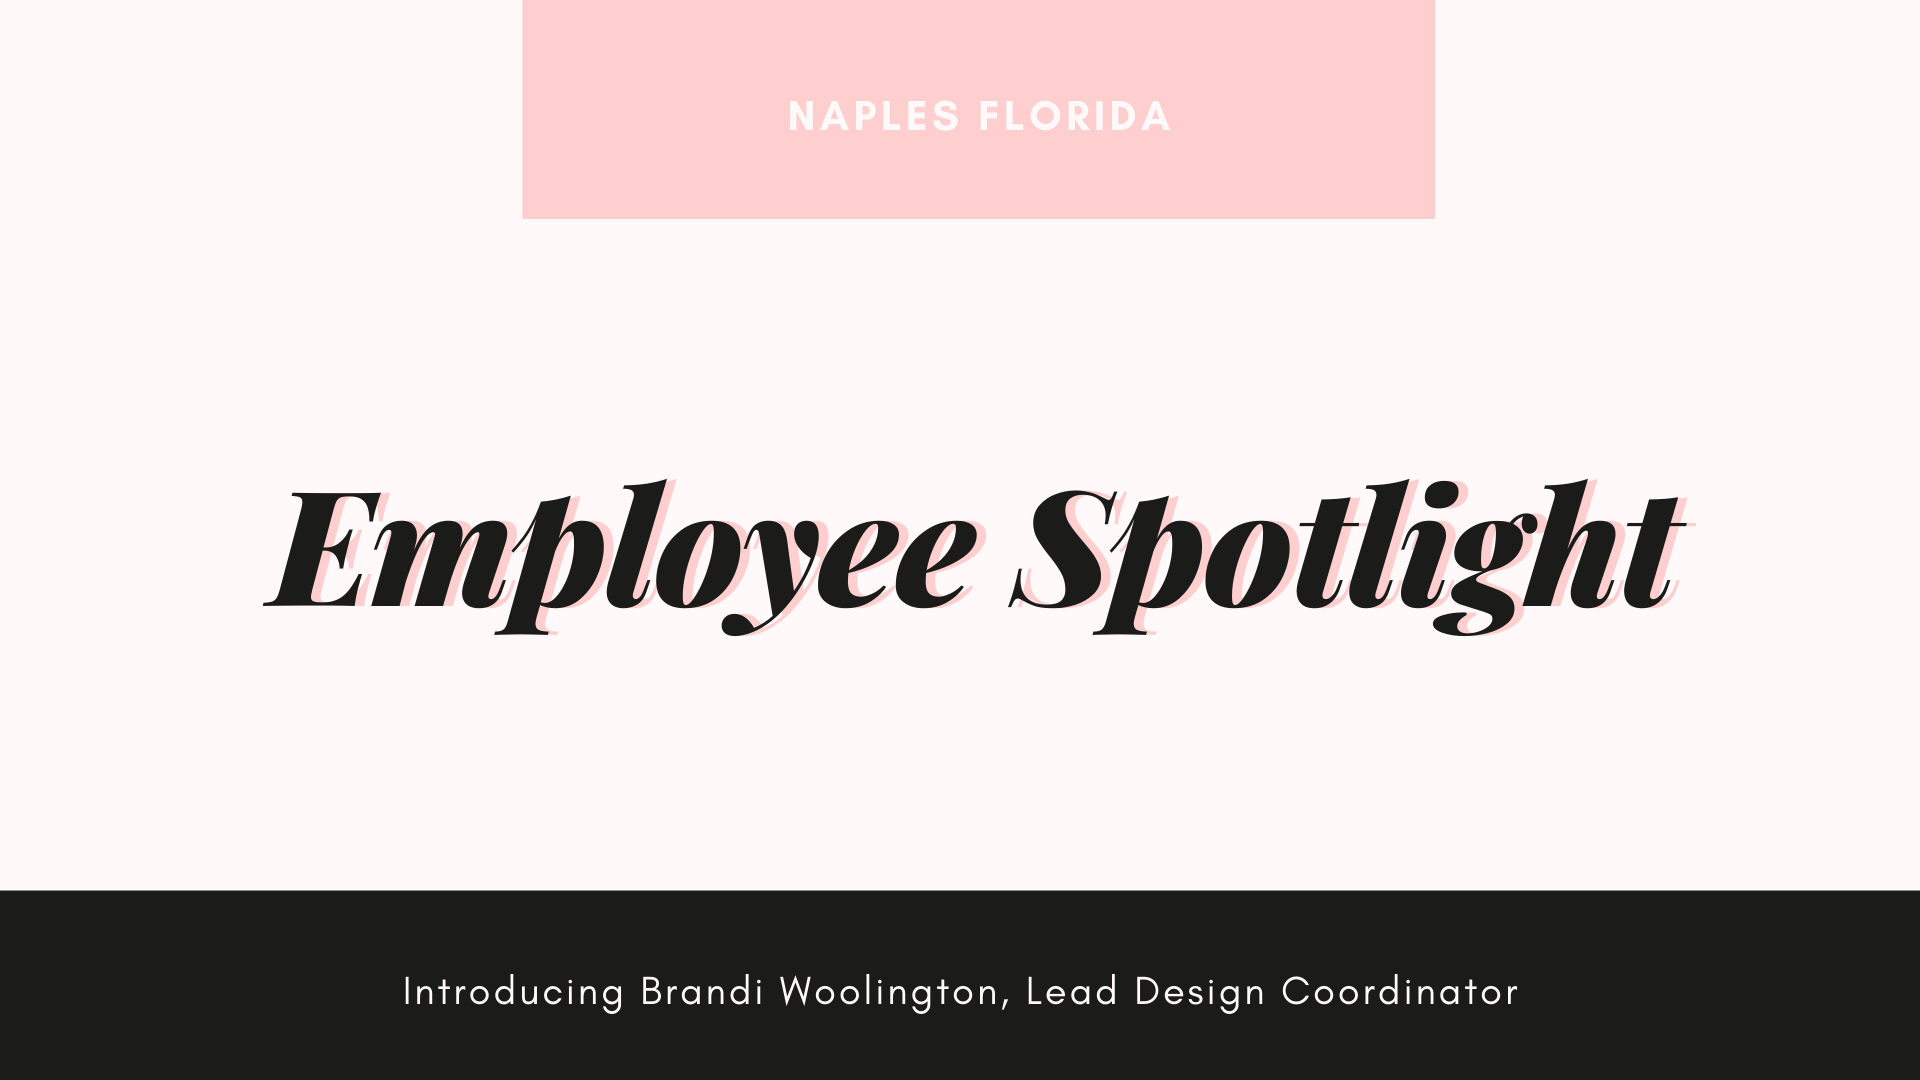 Naples Employee Spotlight